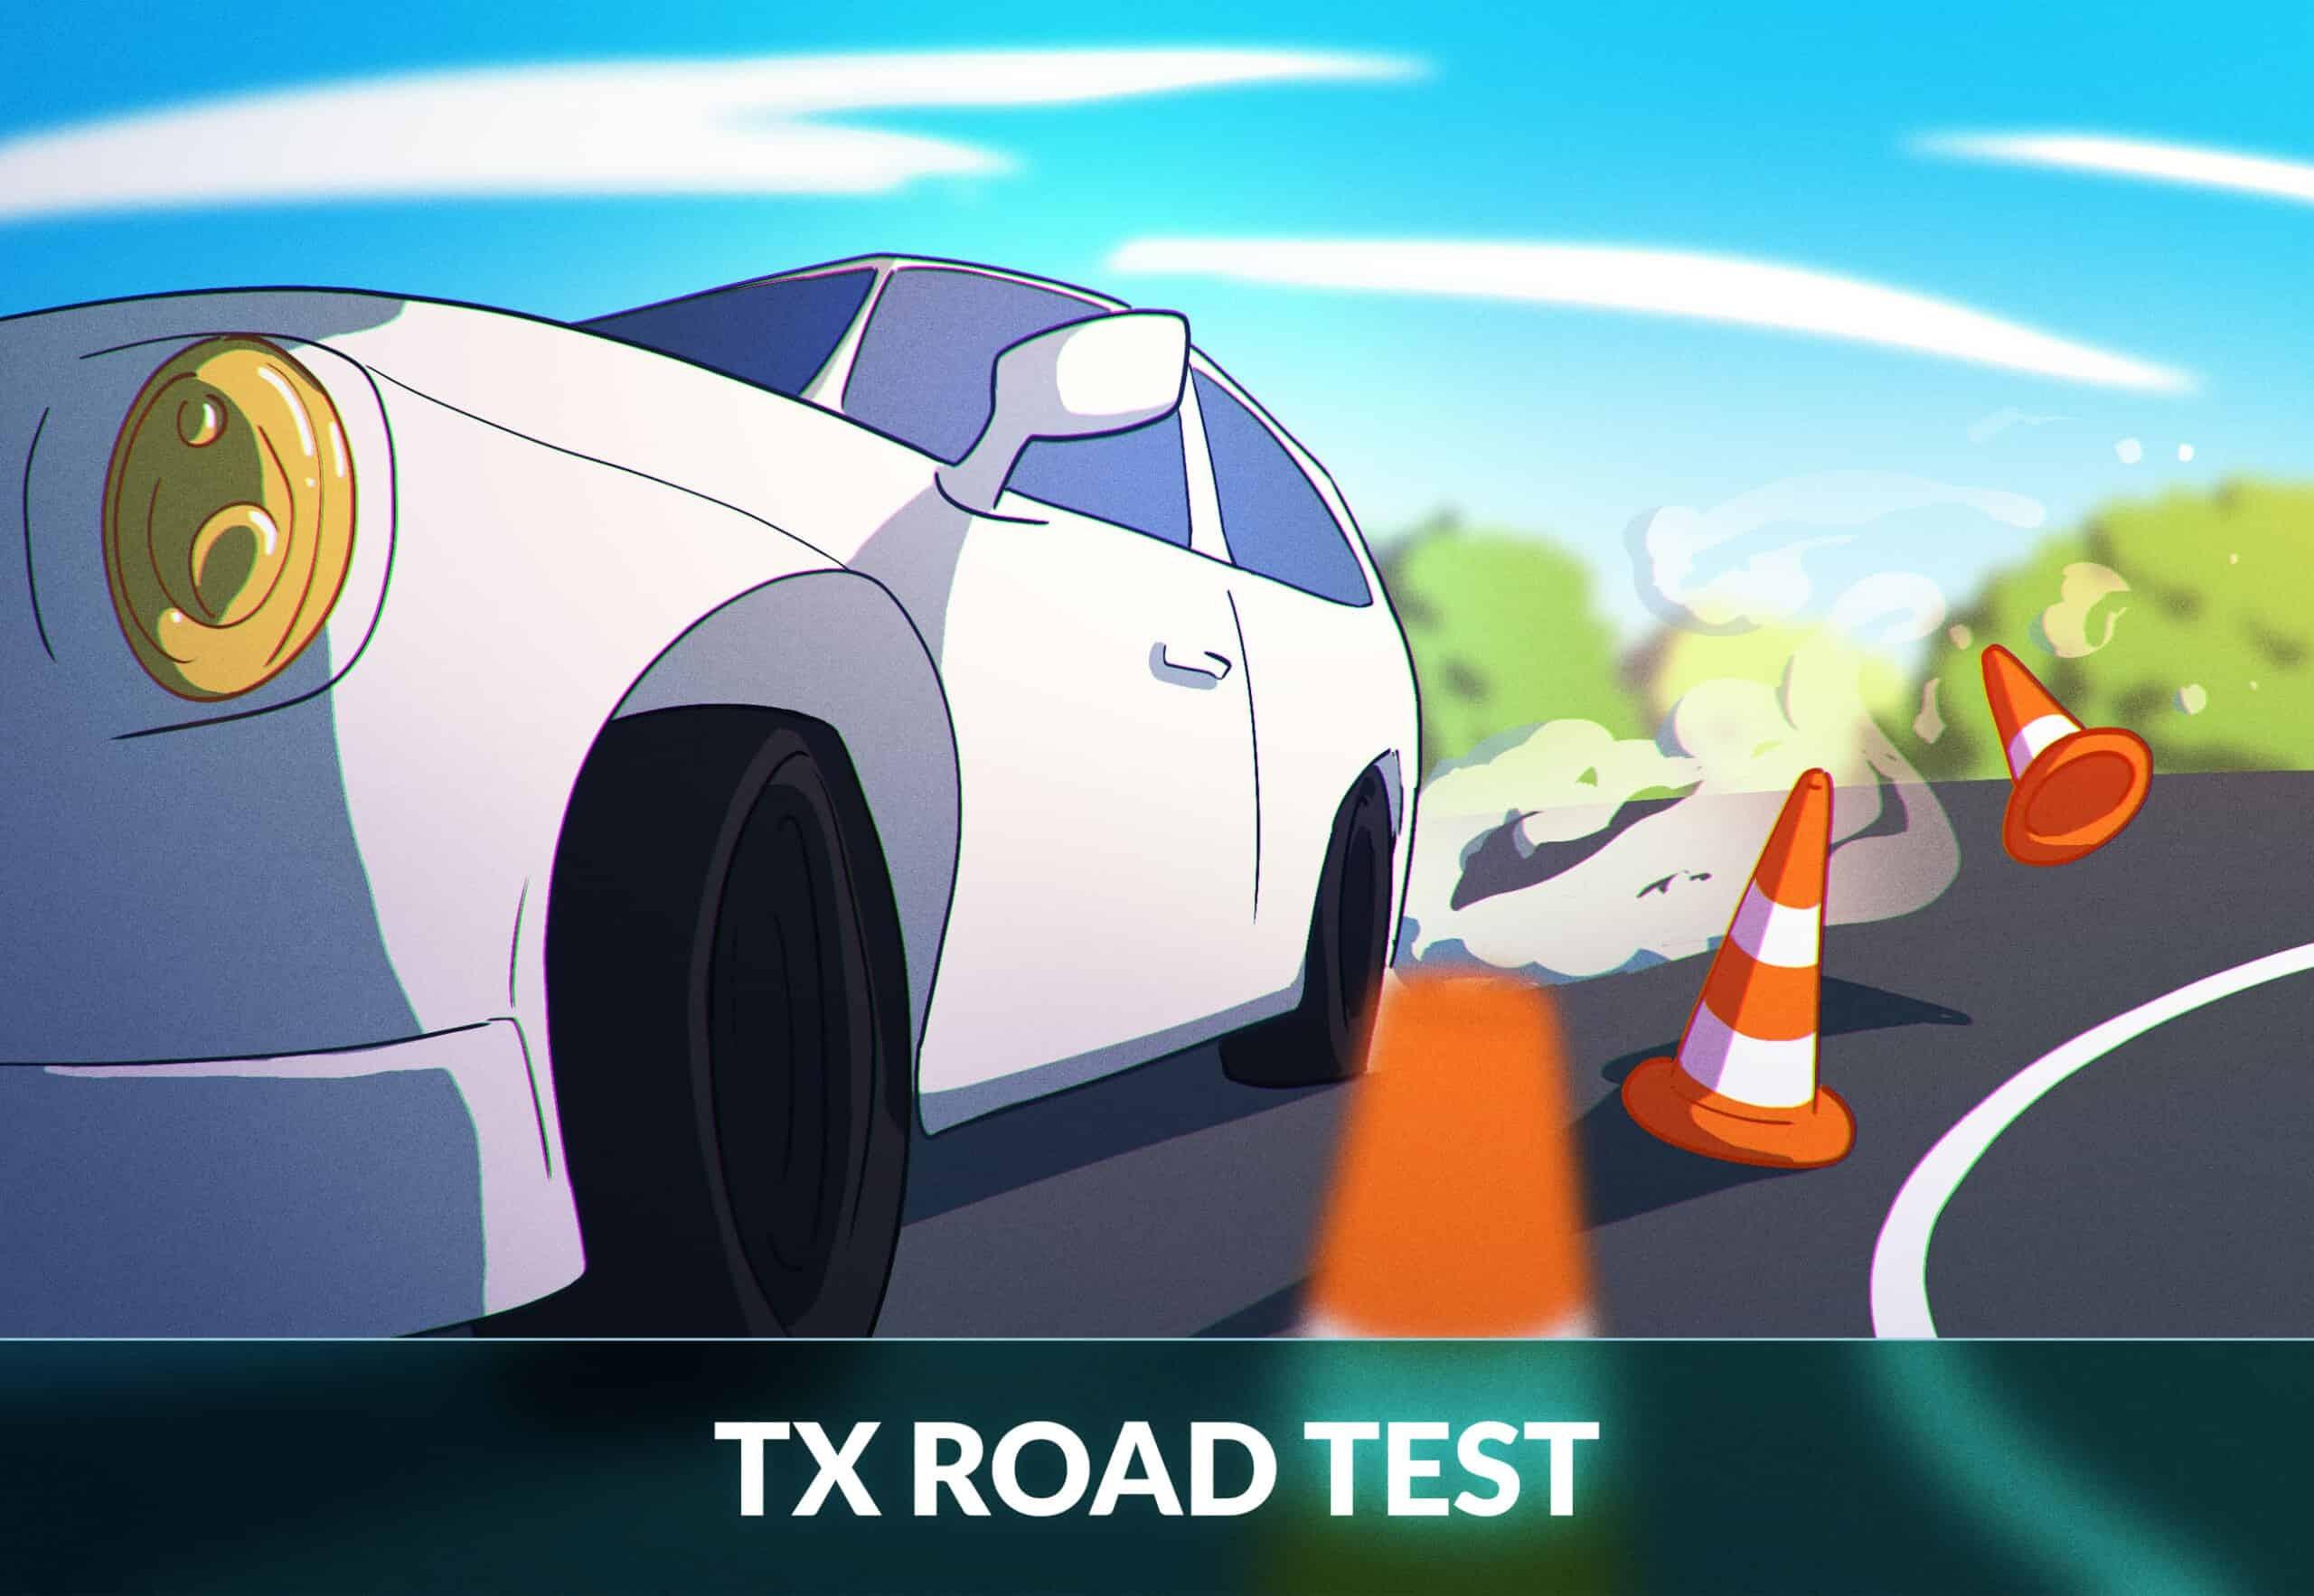 Texas road test